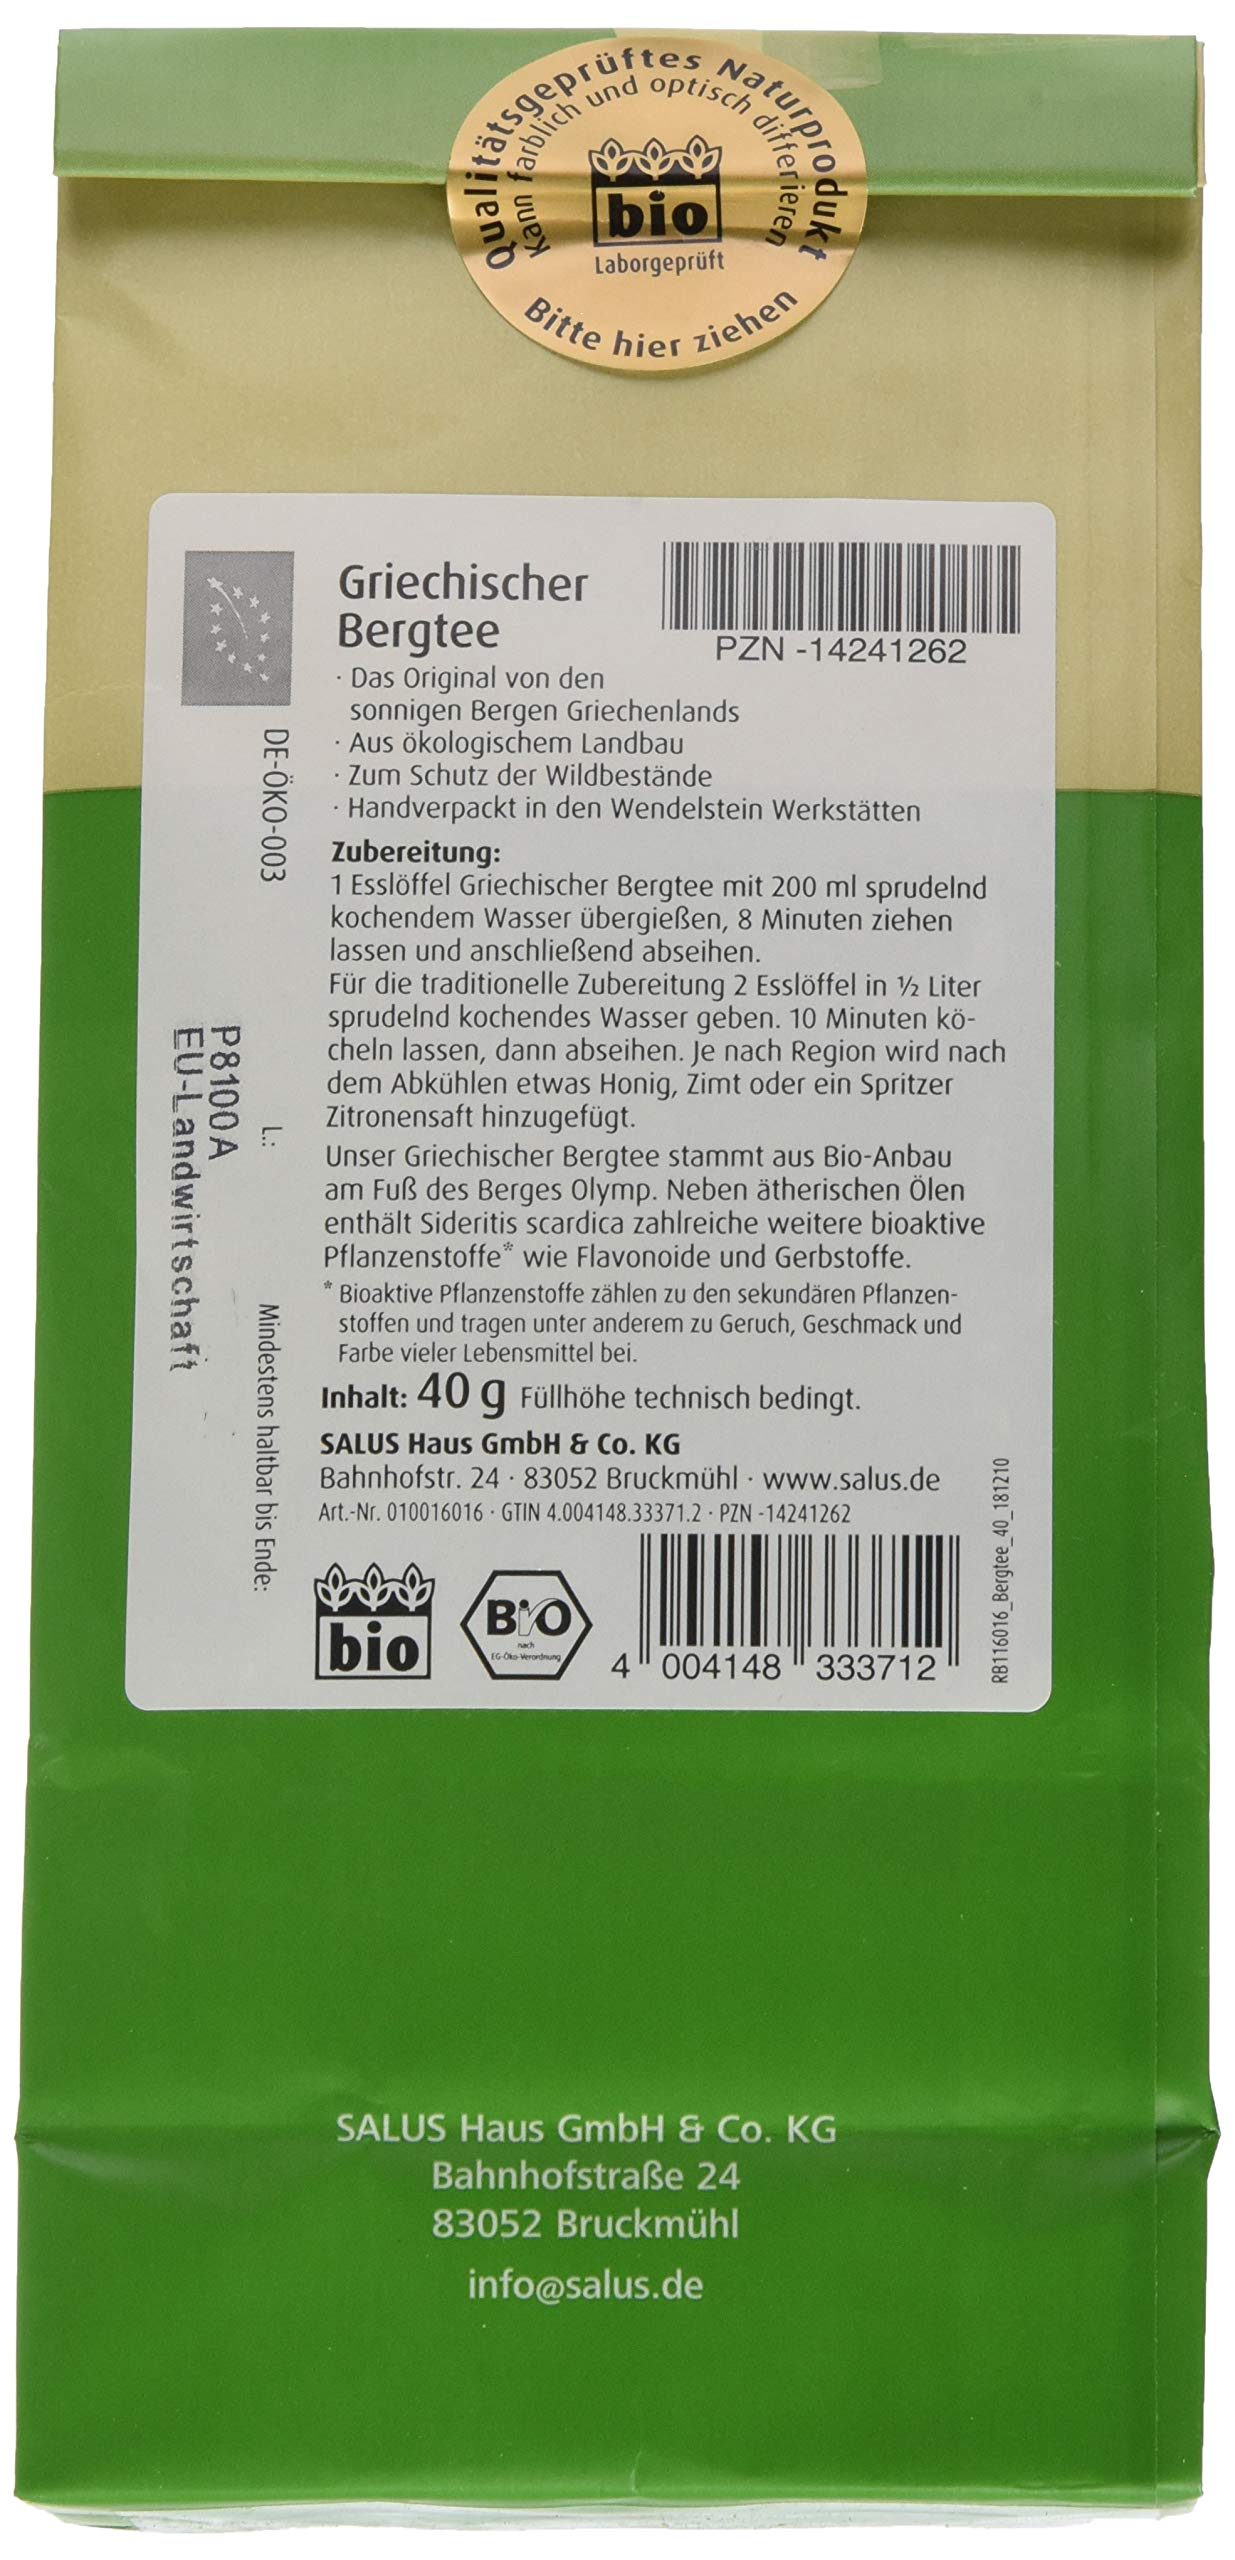 Salus-Griechischer-Bergtee-Bio-2er-Pack-2-x-40-g